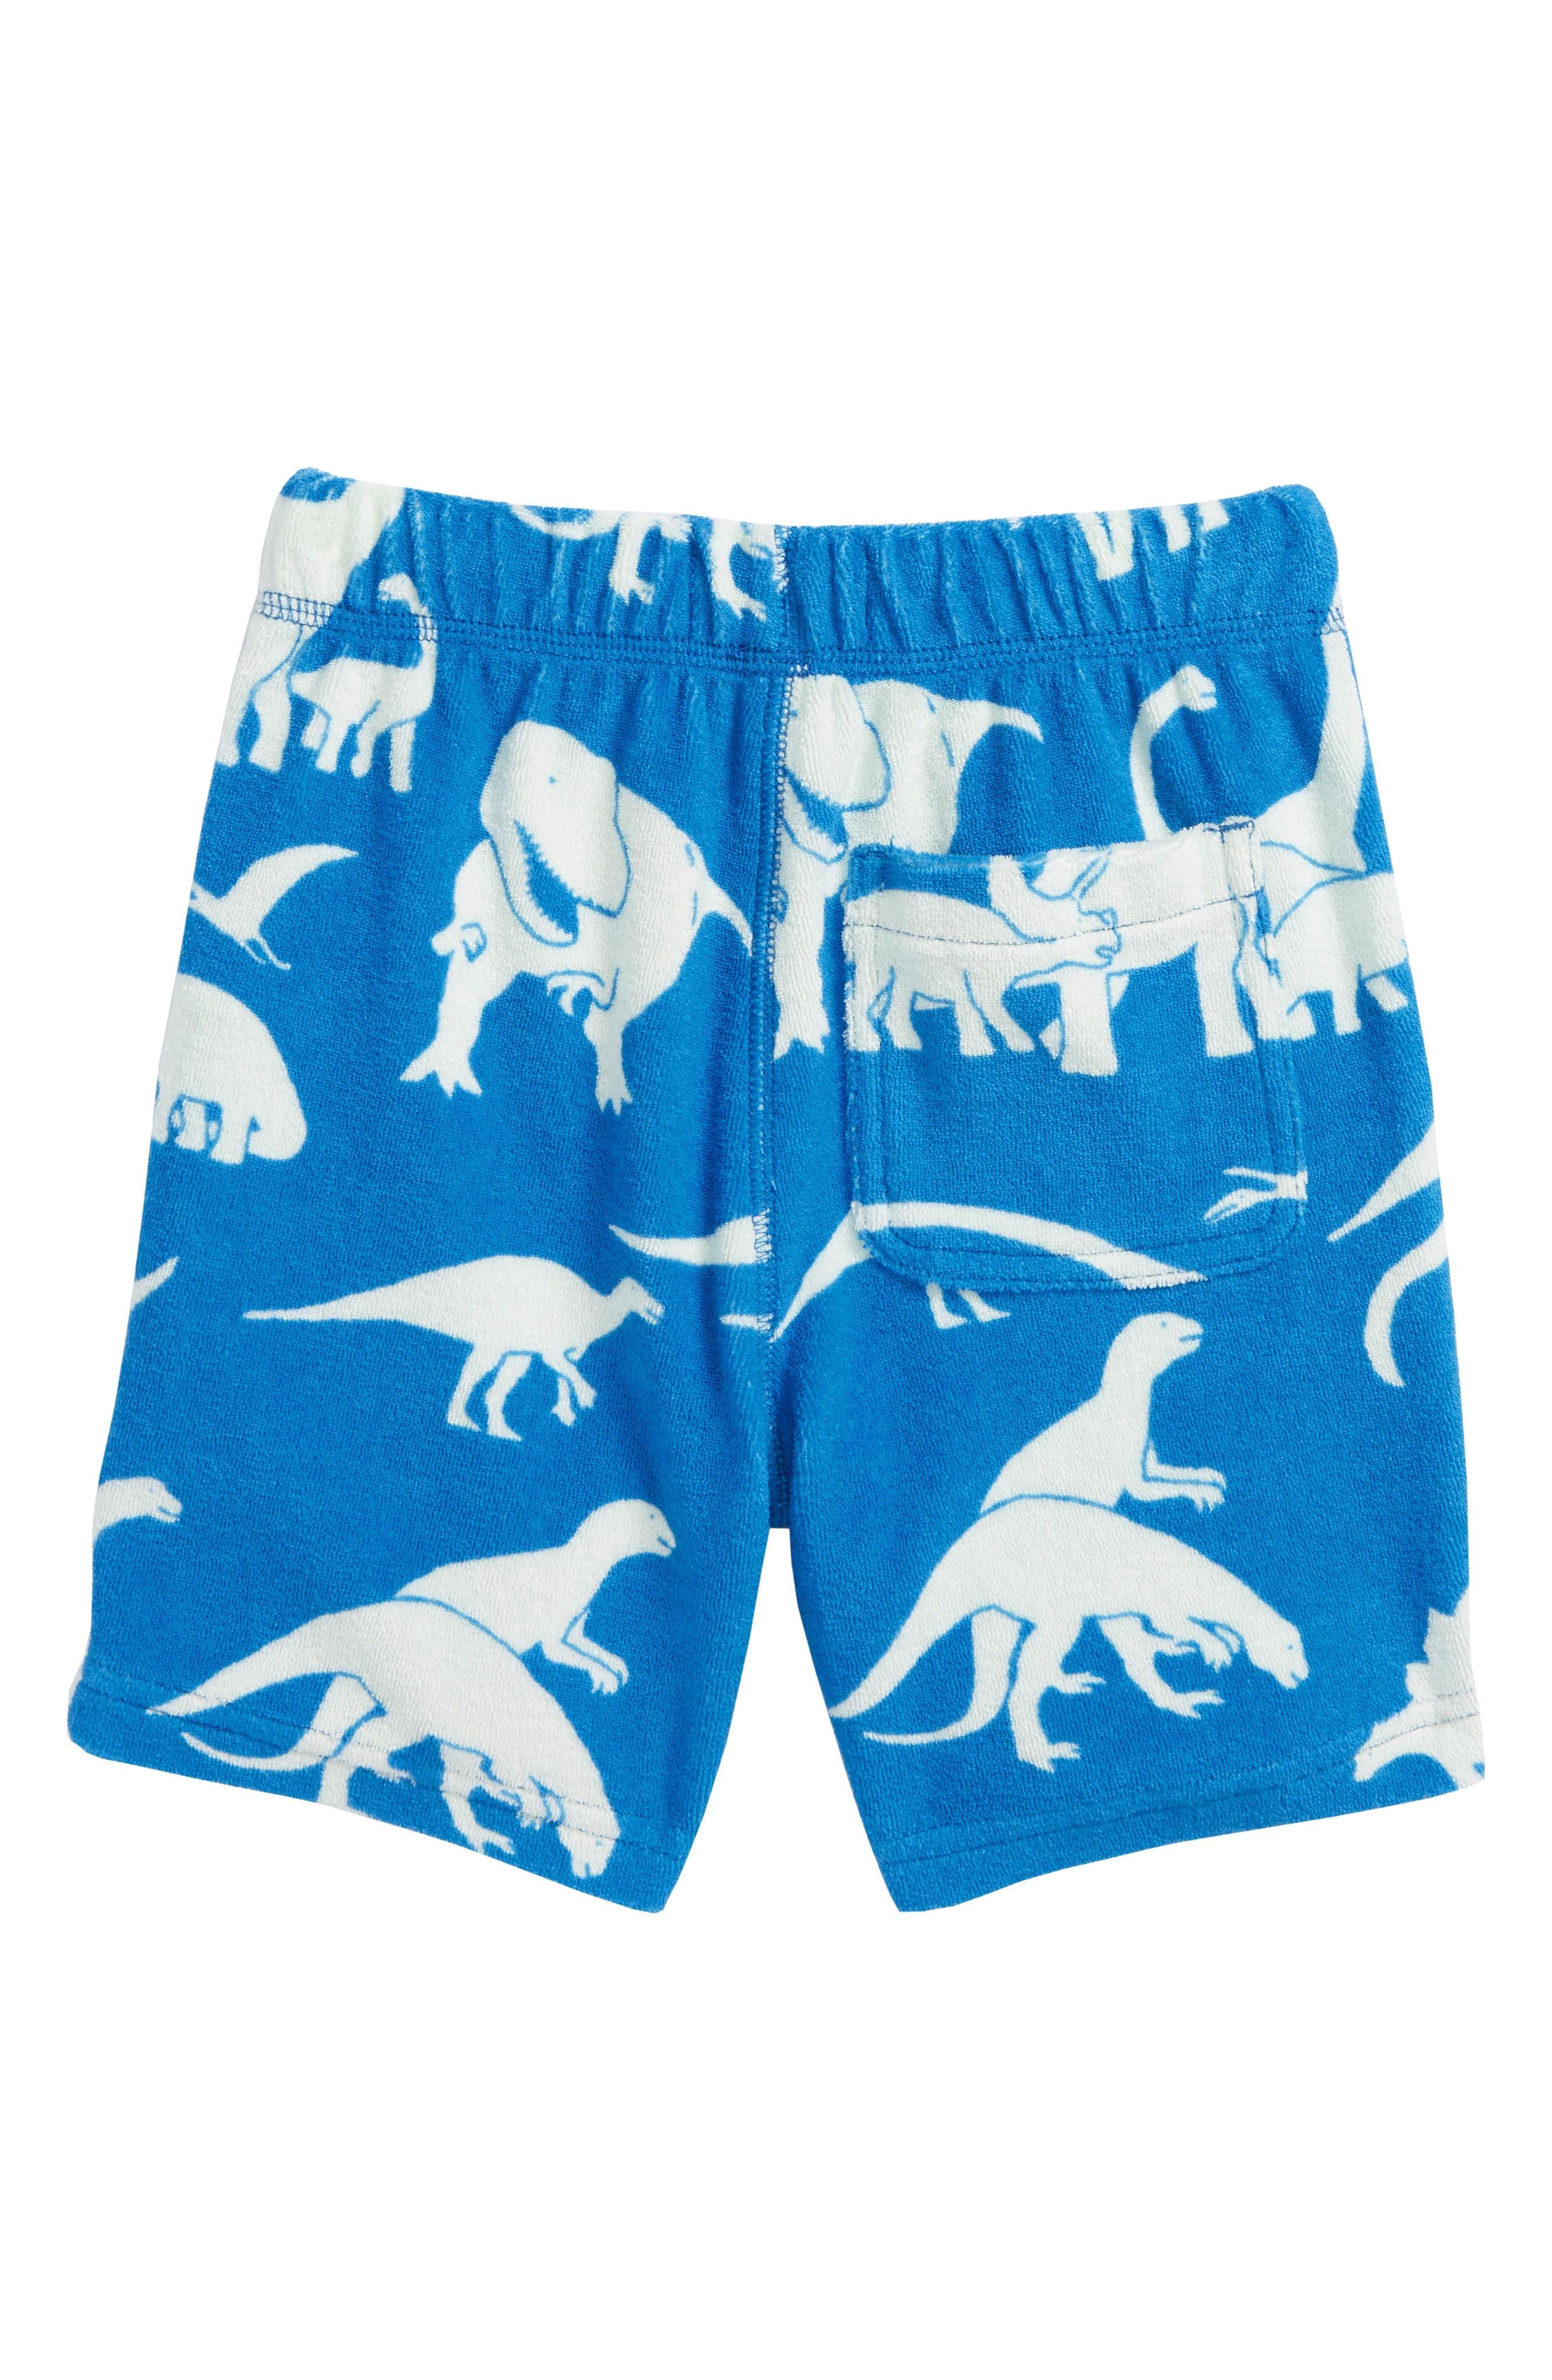 Dino Toweling Shorts,                             Alternate thumbnail 2, color,                             Yogo Blue Dinosaurs